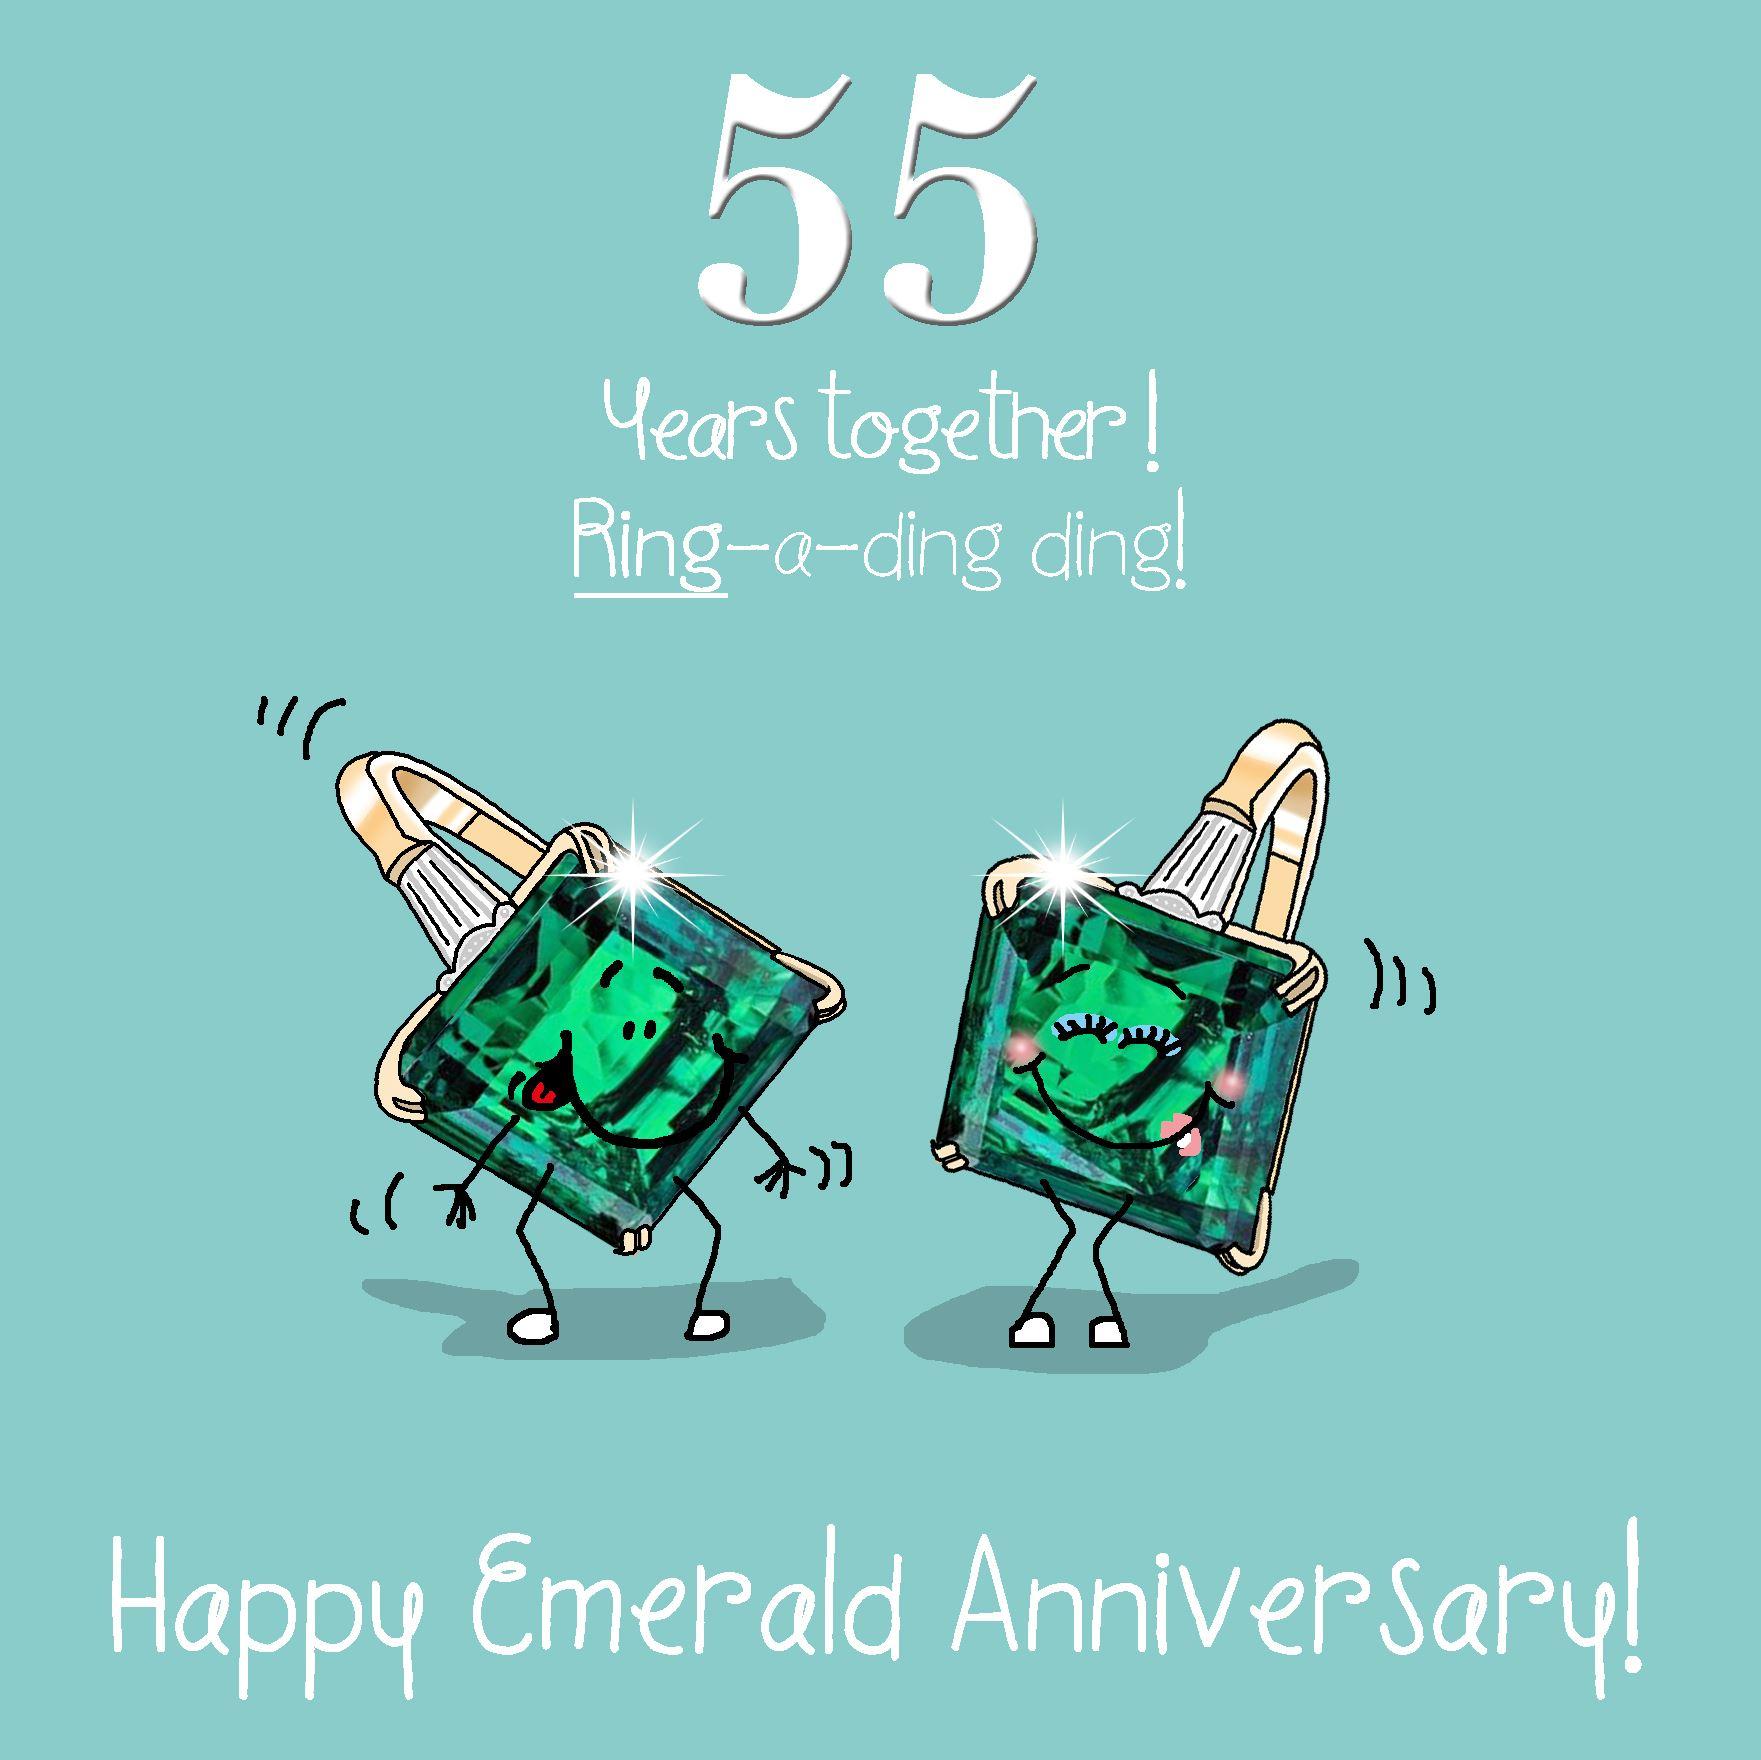 55th Wedding Anniversary Greetings Card Emerald Anniversary